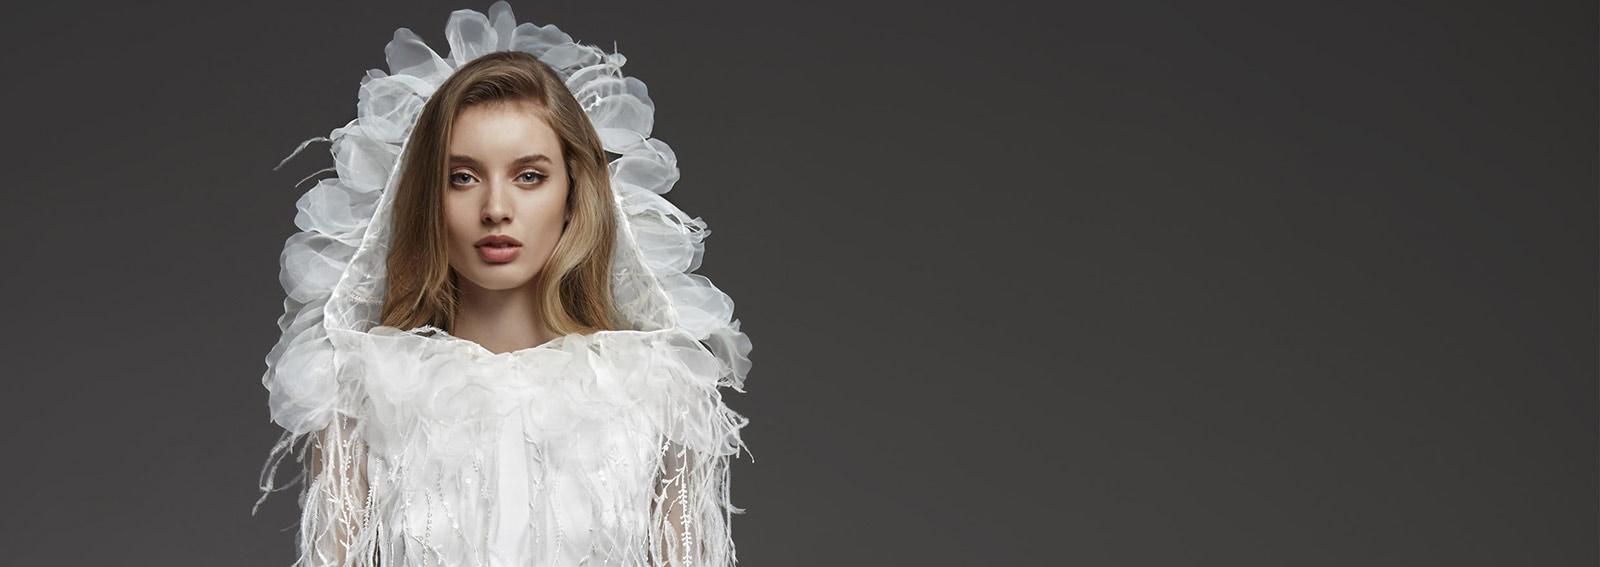 COVER-pronovias-winter-wedding-19-DESKTOP